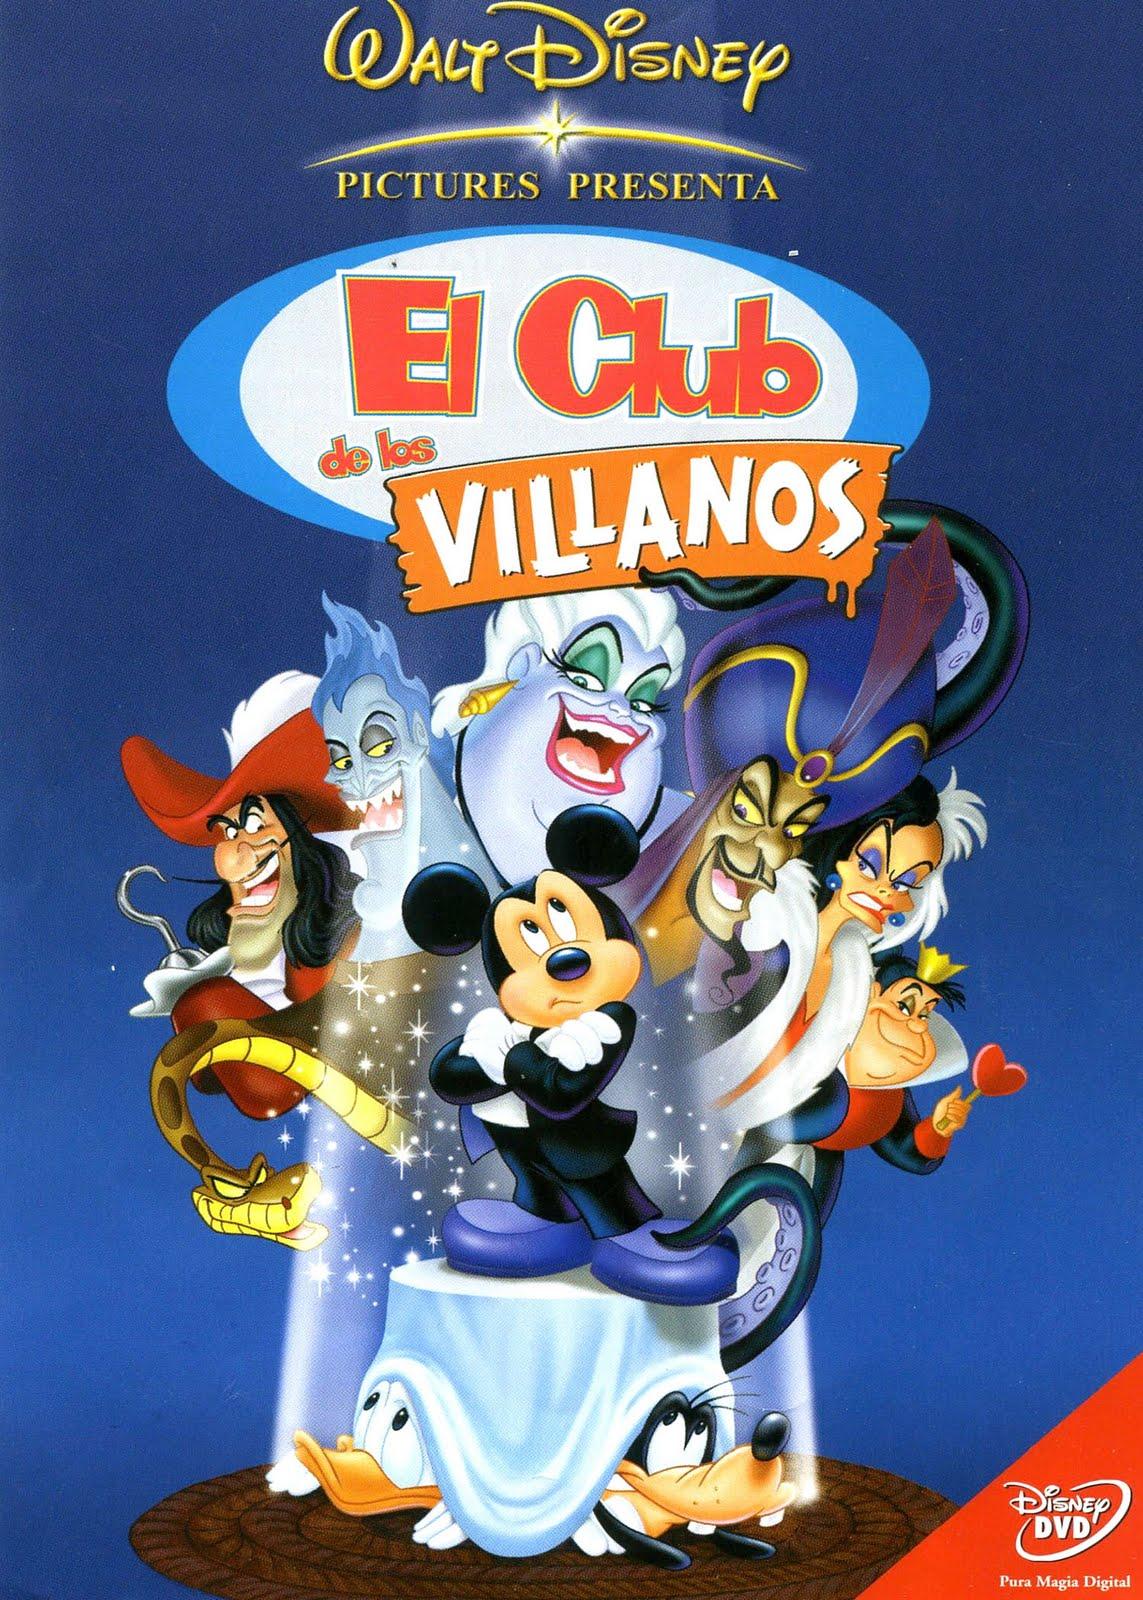 http://1.bp.blogspot.com/-k6BqNtXioxA/Tf4F2DbkFRI/AAAAAAAADcU/Dkg2tGes-gU/s1600/El+Club+De+Los+Villanos.jpg